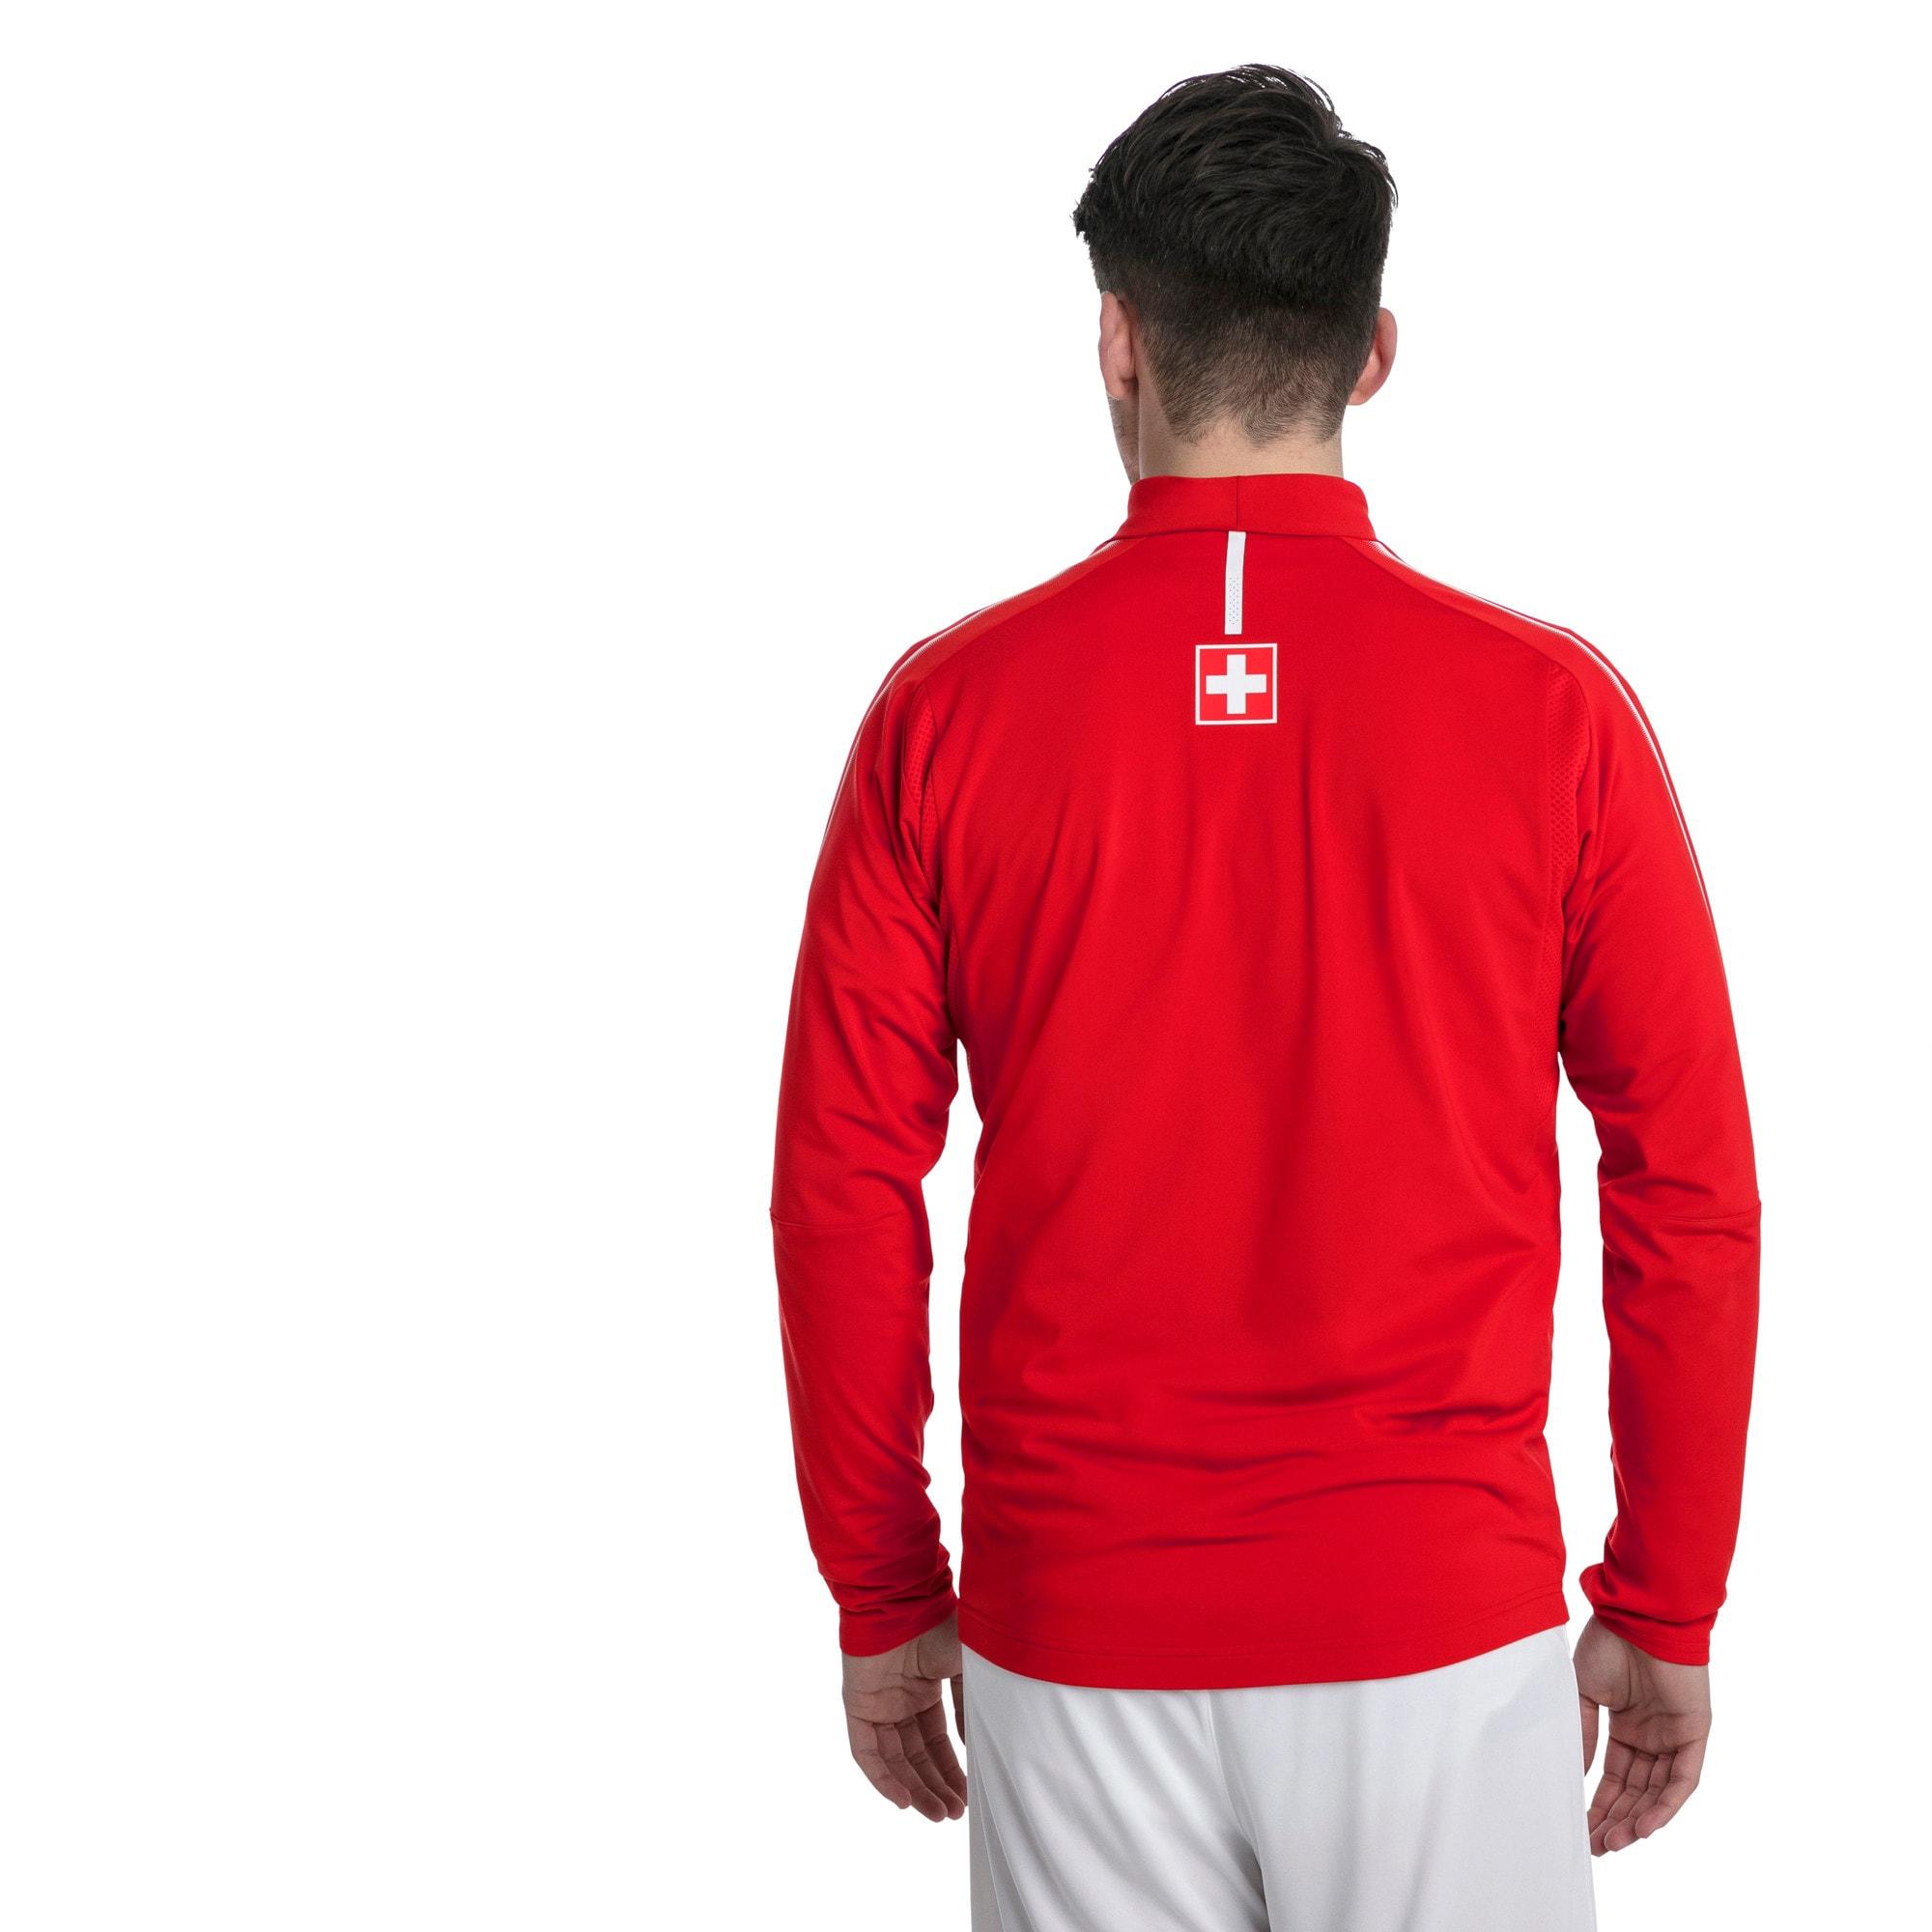 Thumbnail 3 of Trainingstop van Zwitserland met korte rits, Puma Red-Puma White, medium